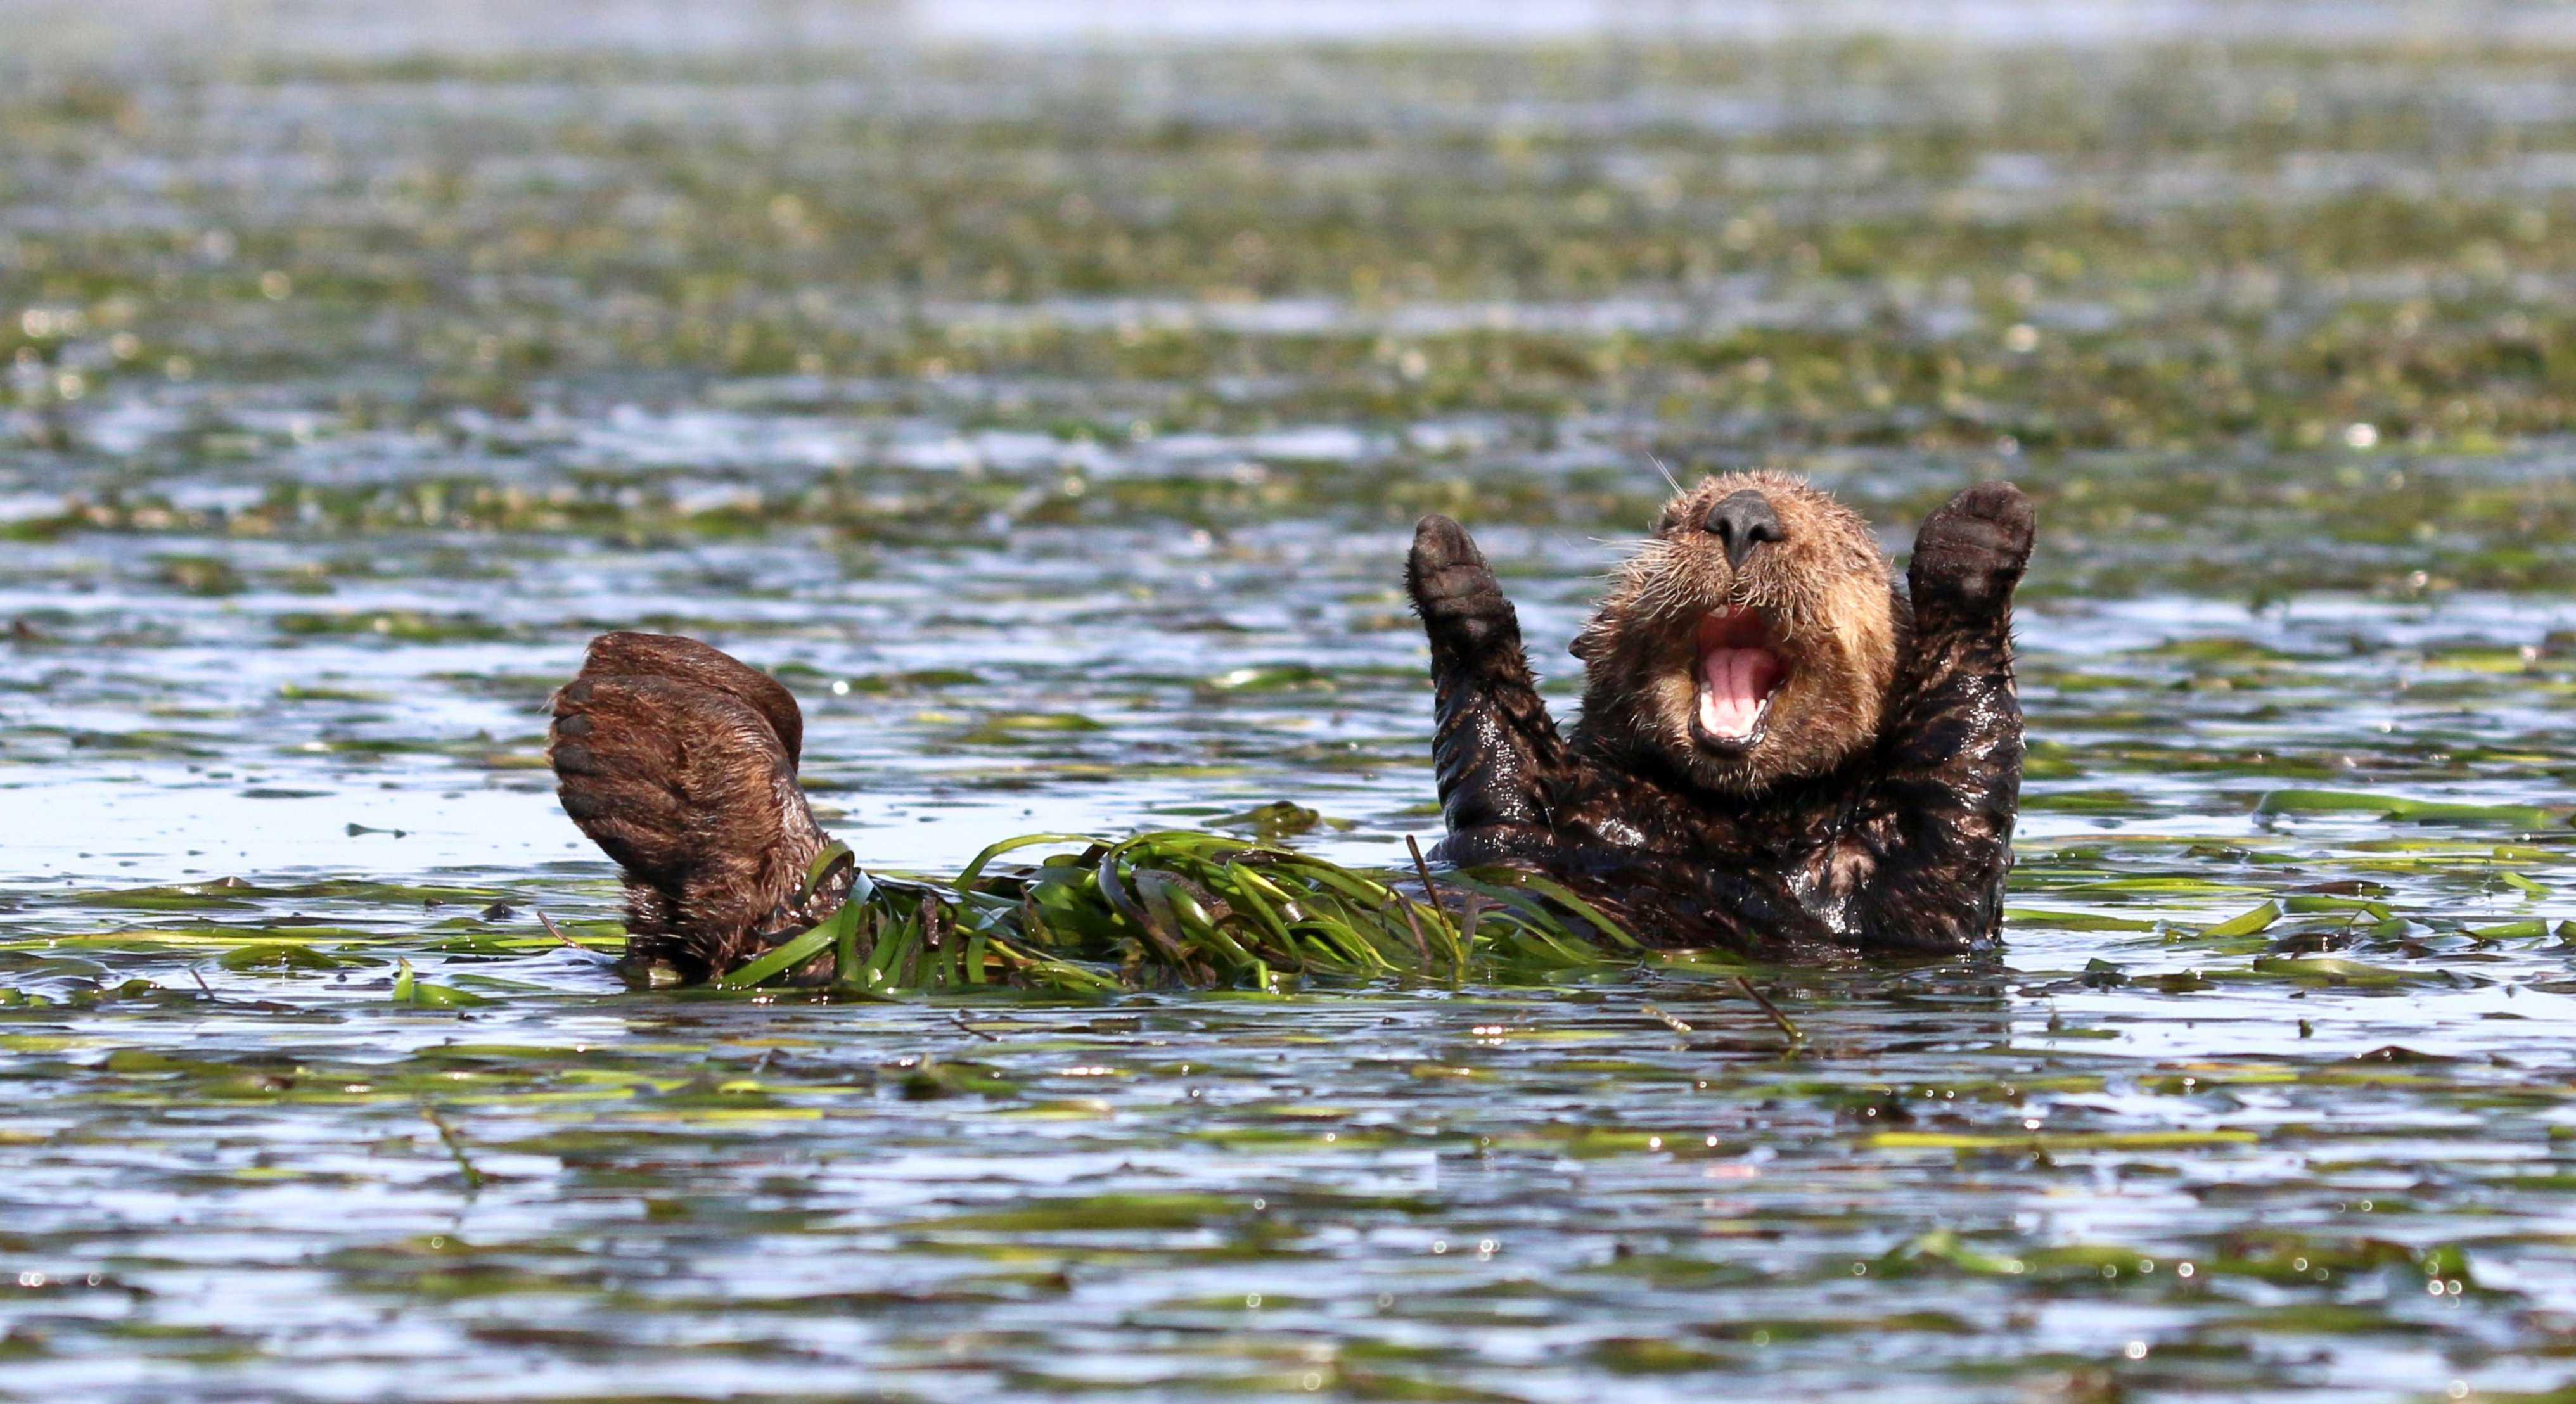 beaver enjoying a swim